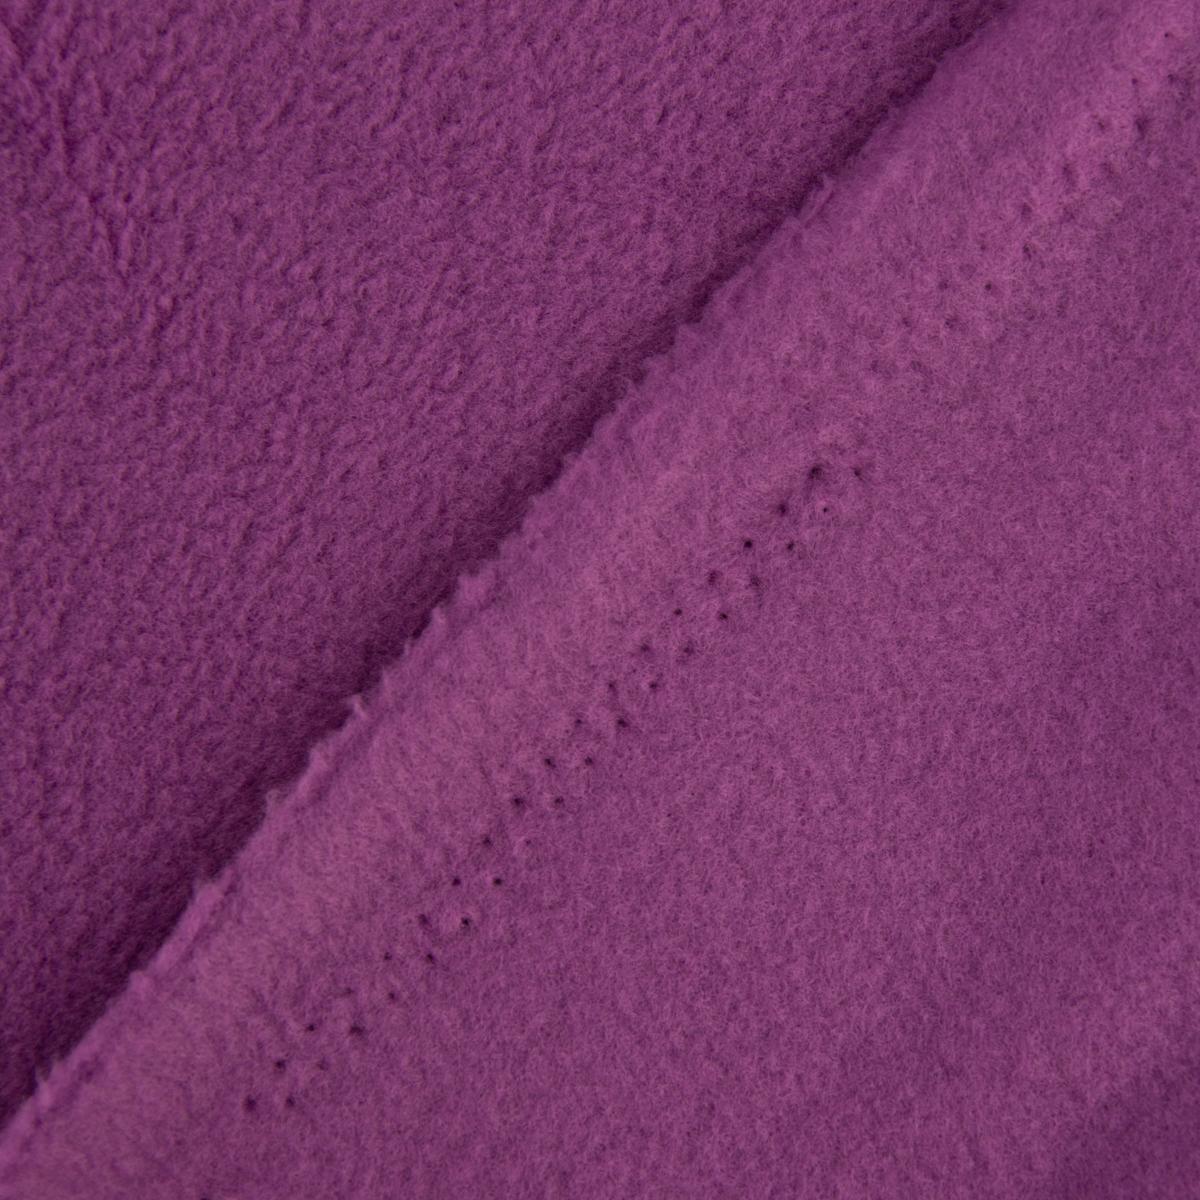 polar fleece stoffe fleecestoff lila beere 1 50m breite alle stoffe stoffe uni fleece. Black Bedroom Furniture Sets. Home Design Ideas